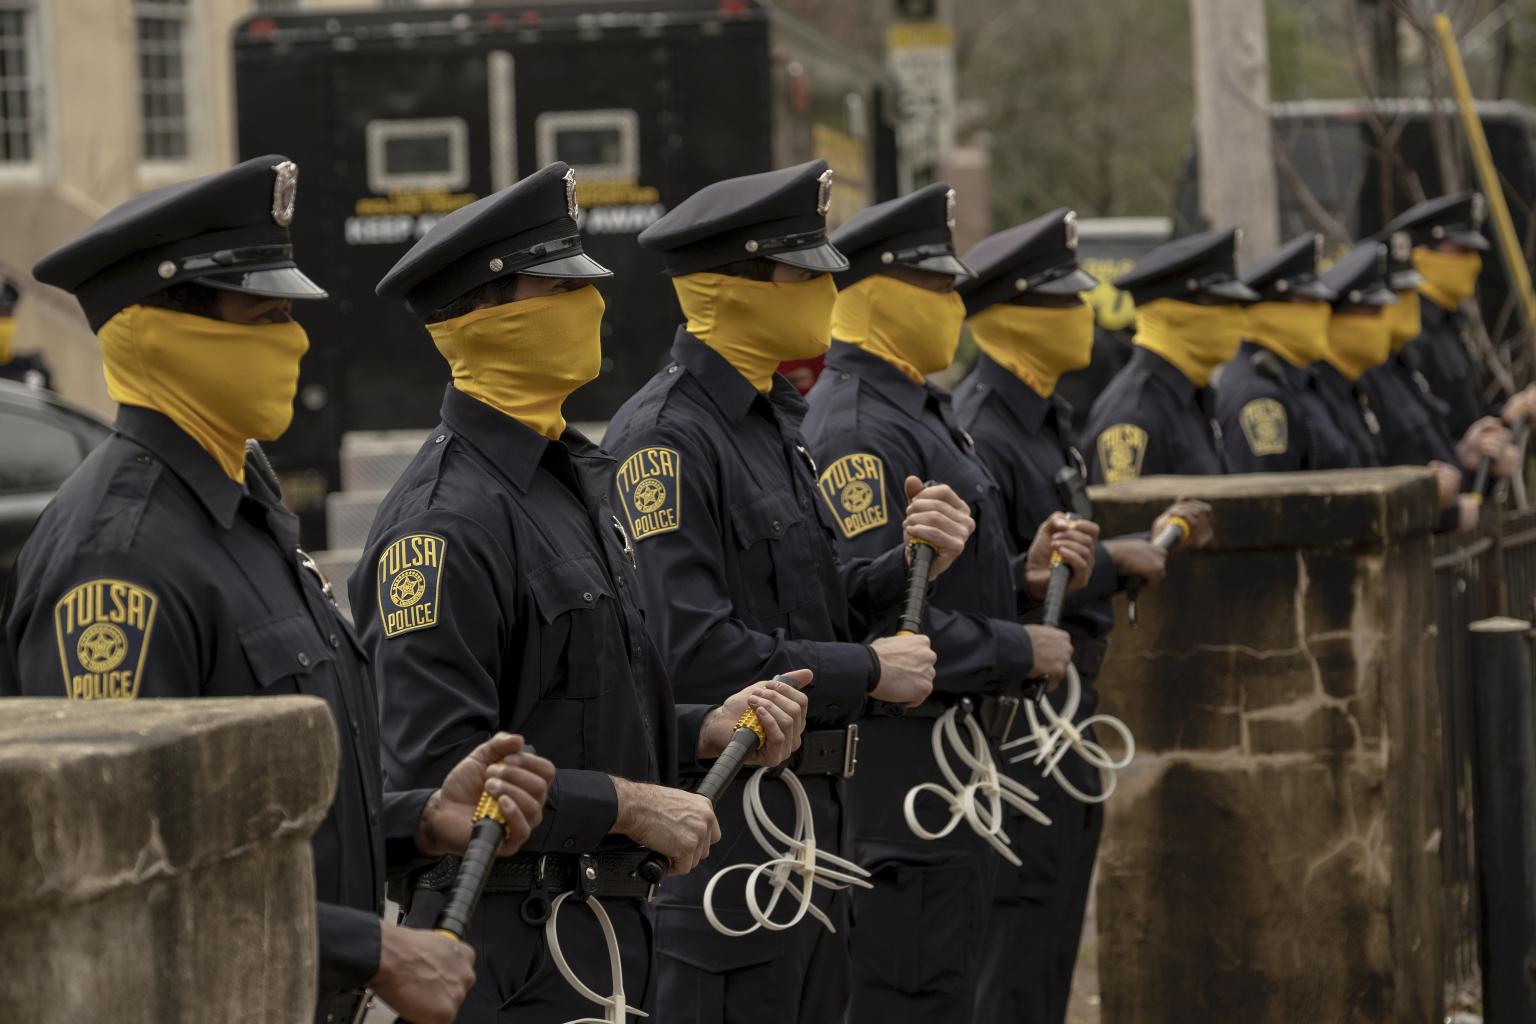 watchmen 3 1536x1024 1